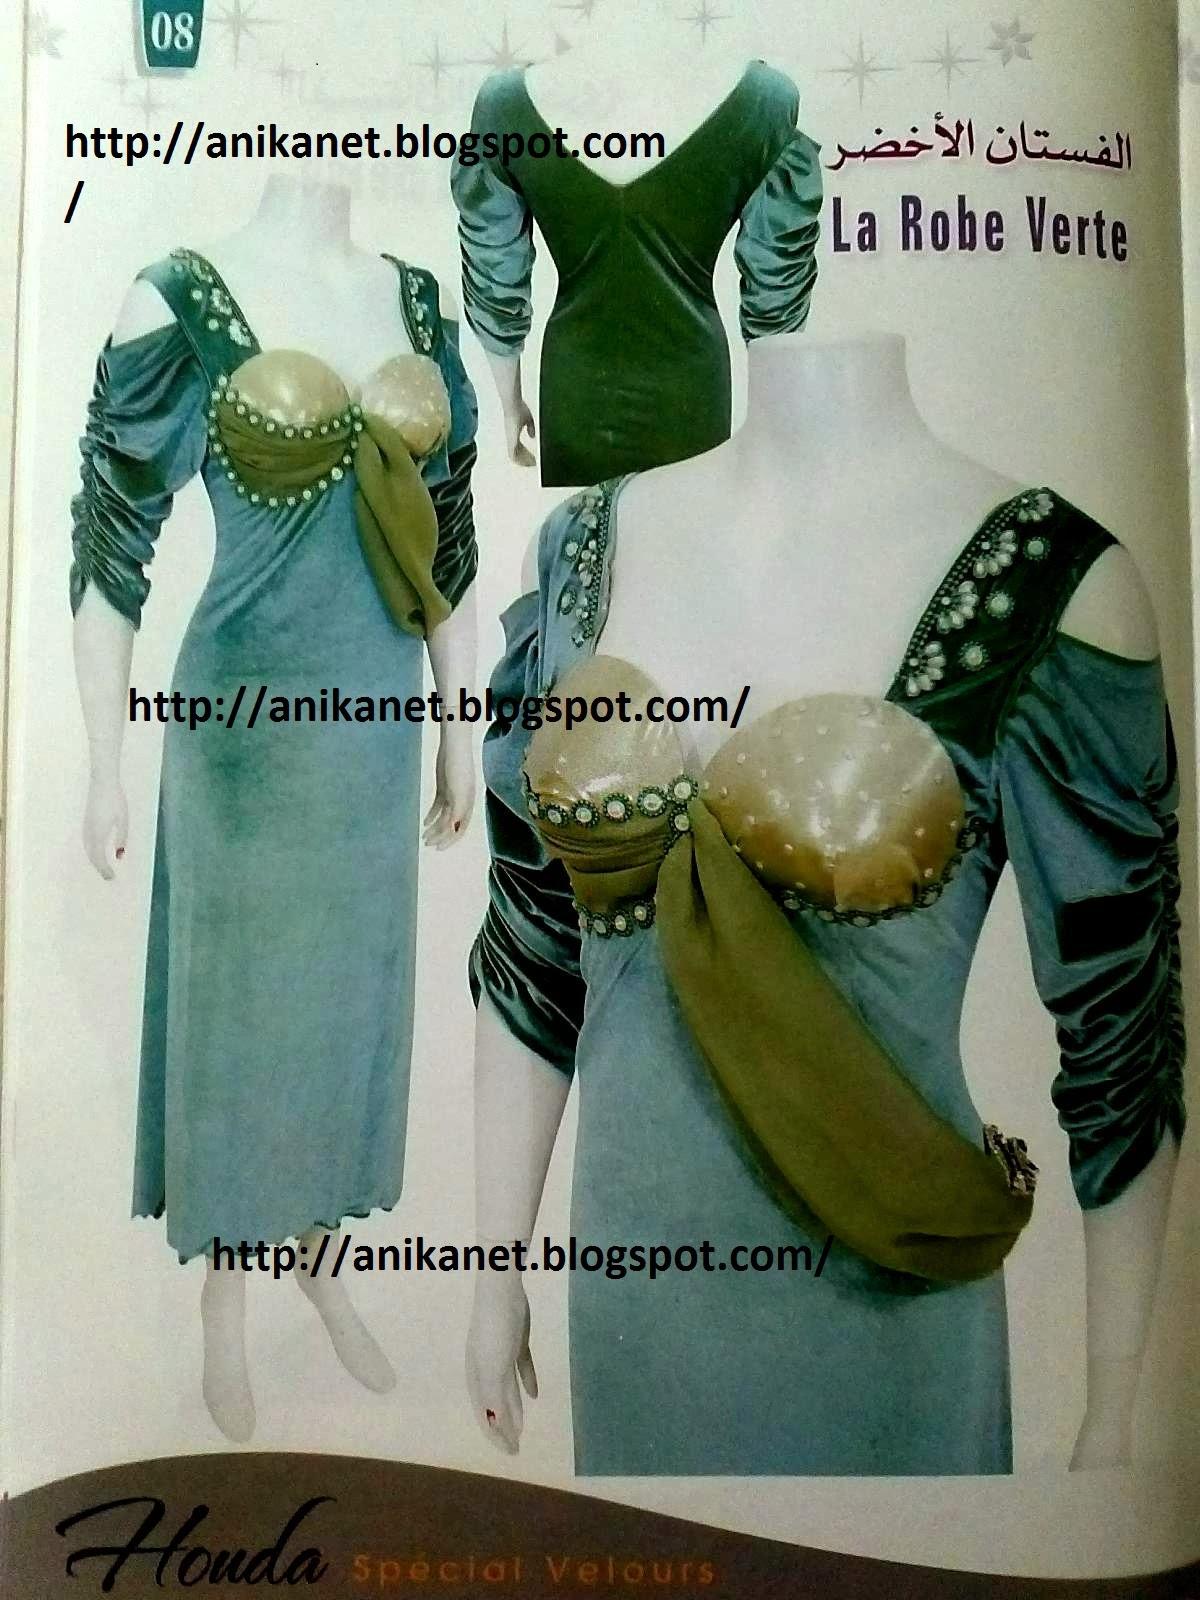 popular posts magazine chahinez n 11 ete 2013 gandoura robe d